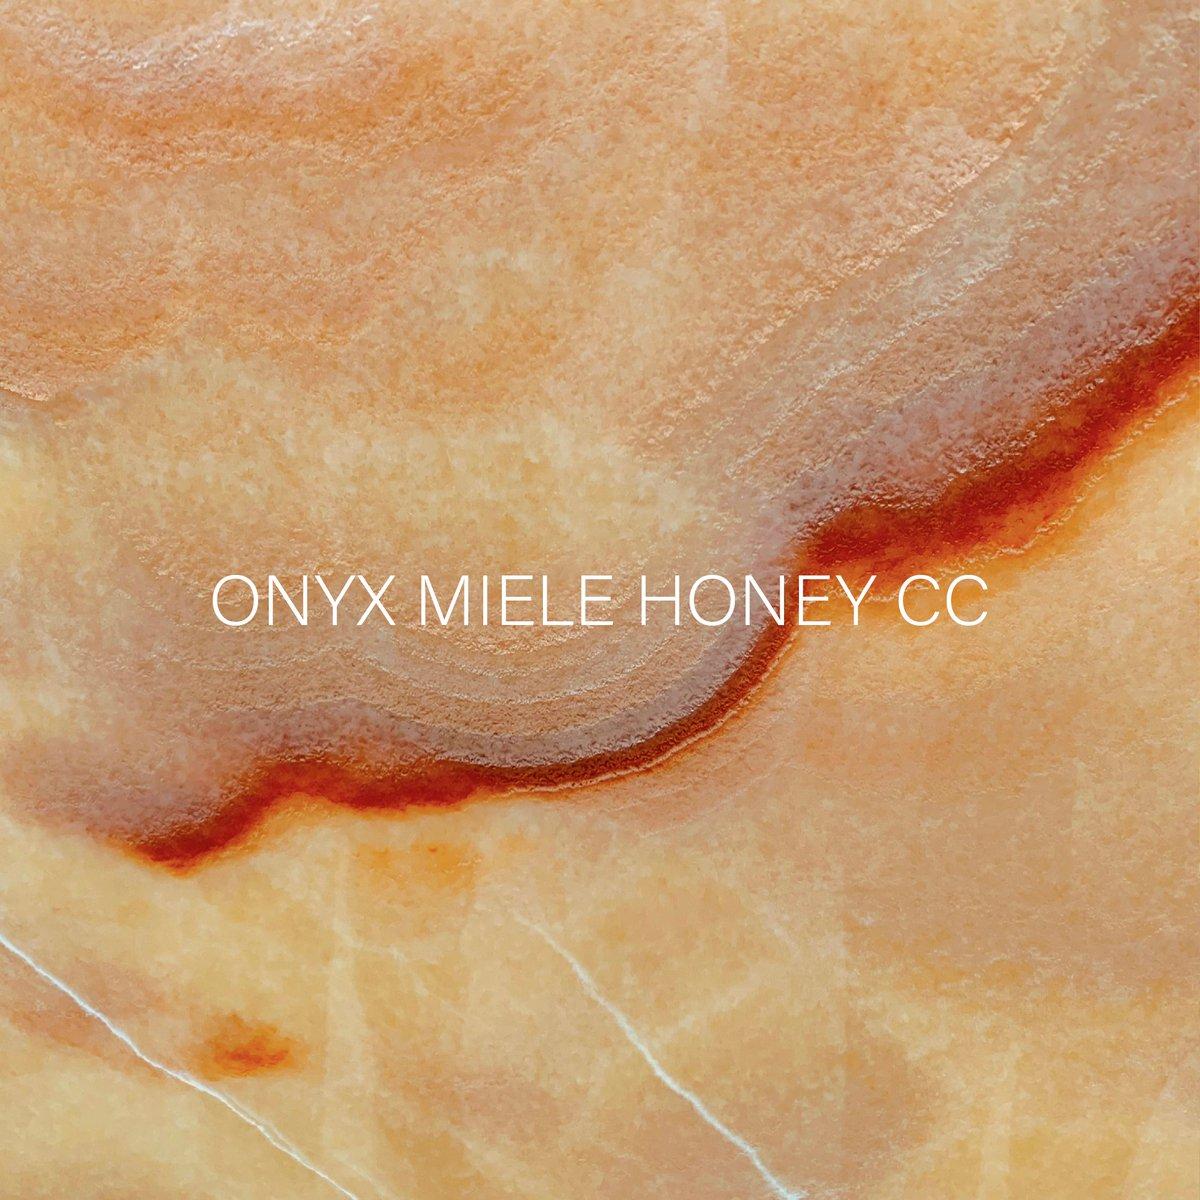 ONYX MIELE HONEY CC | Warm as a sun, sweet as a honey! 😍🍯  #glaze #glazeuae #100PercentNaturalStone #interiordesign #architecture #homedesign #homedecor #buildingmaterials https://t.co/vybdFIUKwX